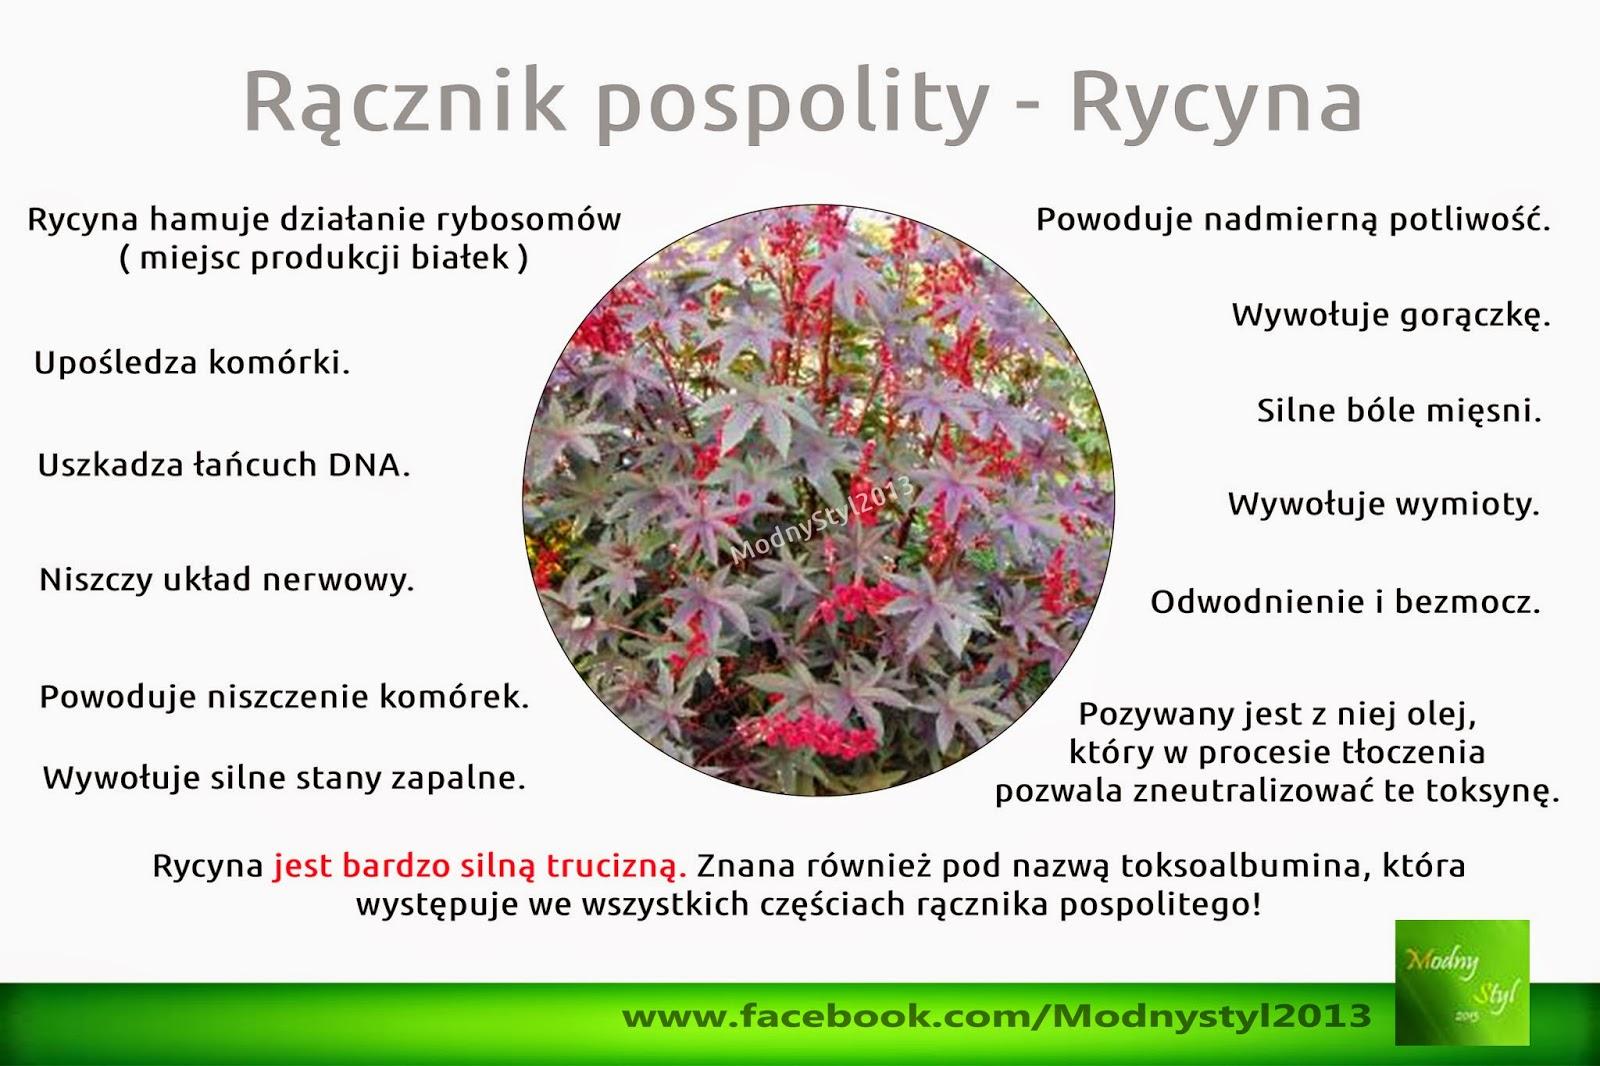 Rącznik pospolity a toksyczna rycyna